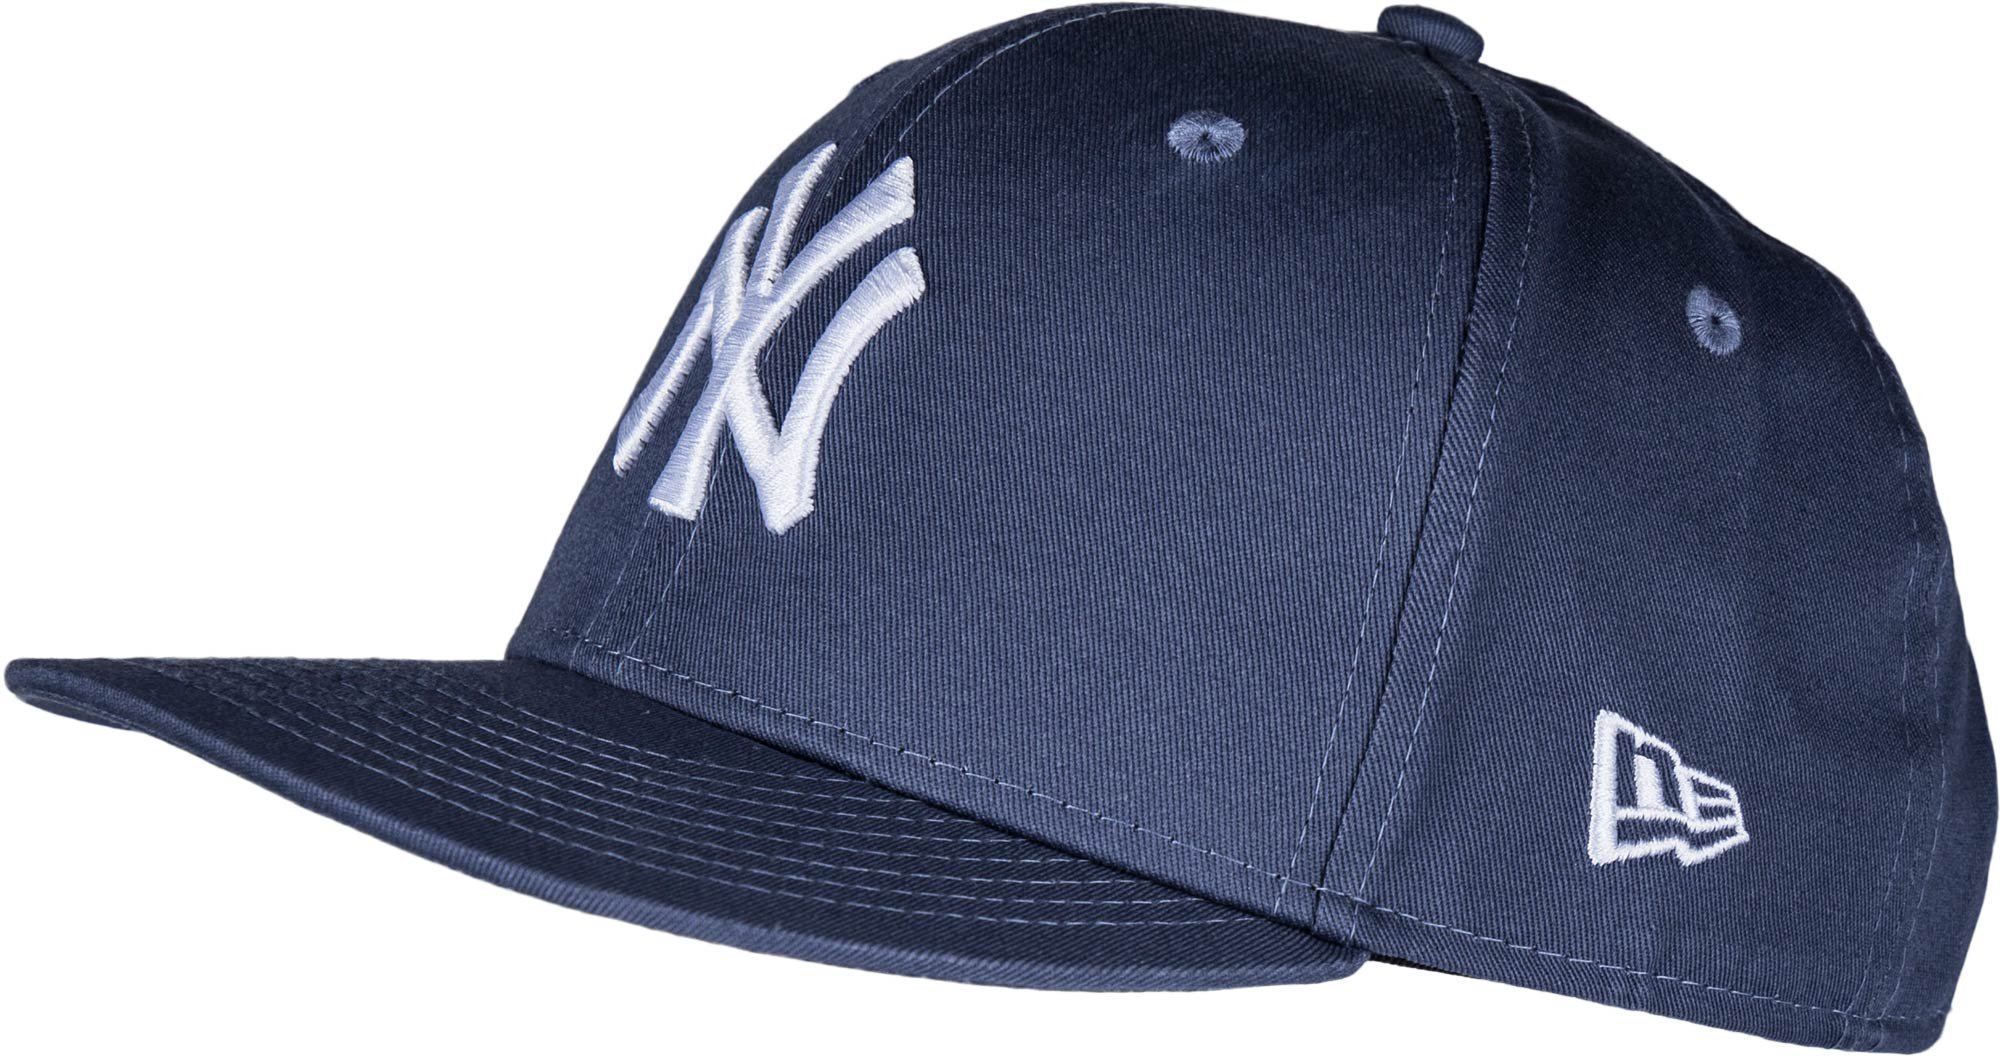 New Era 9FIFTY MLB LEAGUE NEW YORK YANKEES. 1 e65cc45435